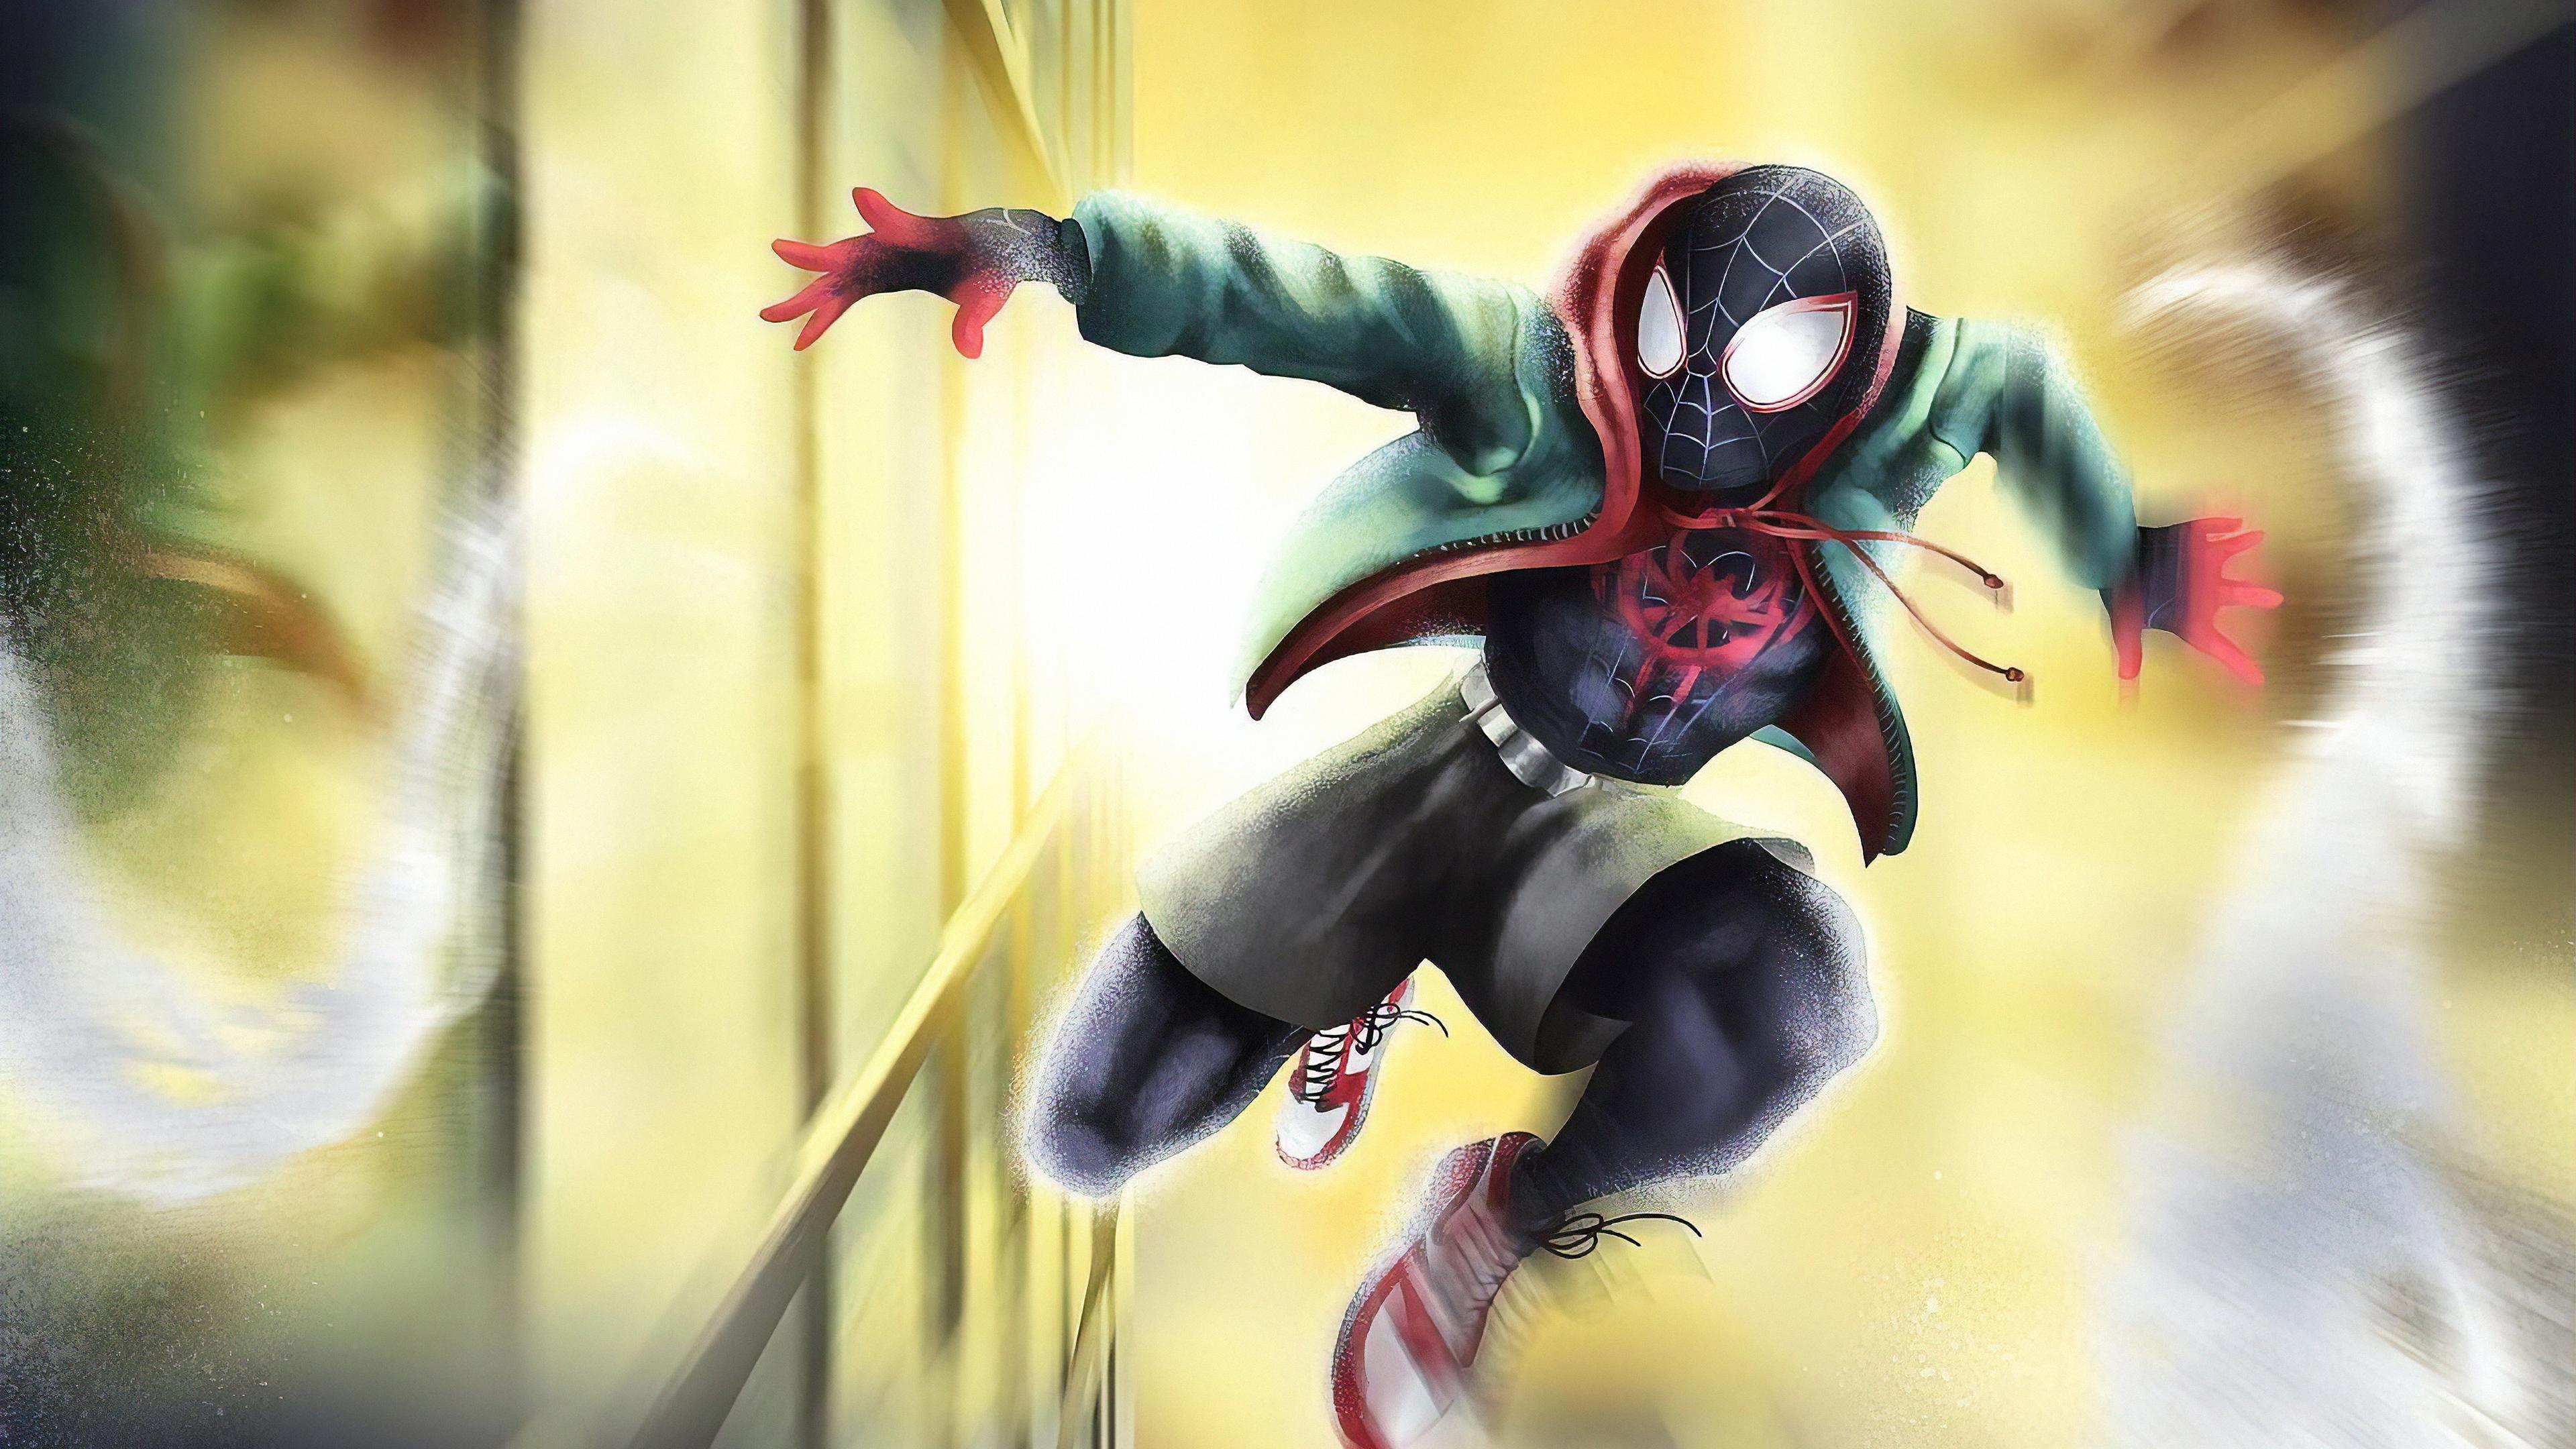 spiderman passing by 1572368324 - Spiderman Passing By - superheroes wallpapers, spiderman wallpapers, hd-wallpapers, digital art wallpapers, artwork wallpapers, artstation wallpapers, art wallpapers, 4k-wallpapers